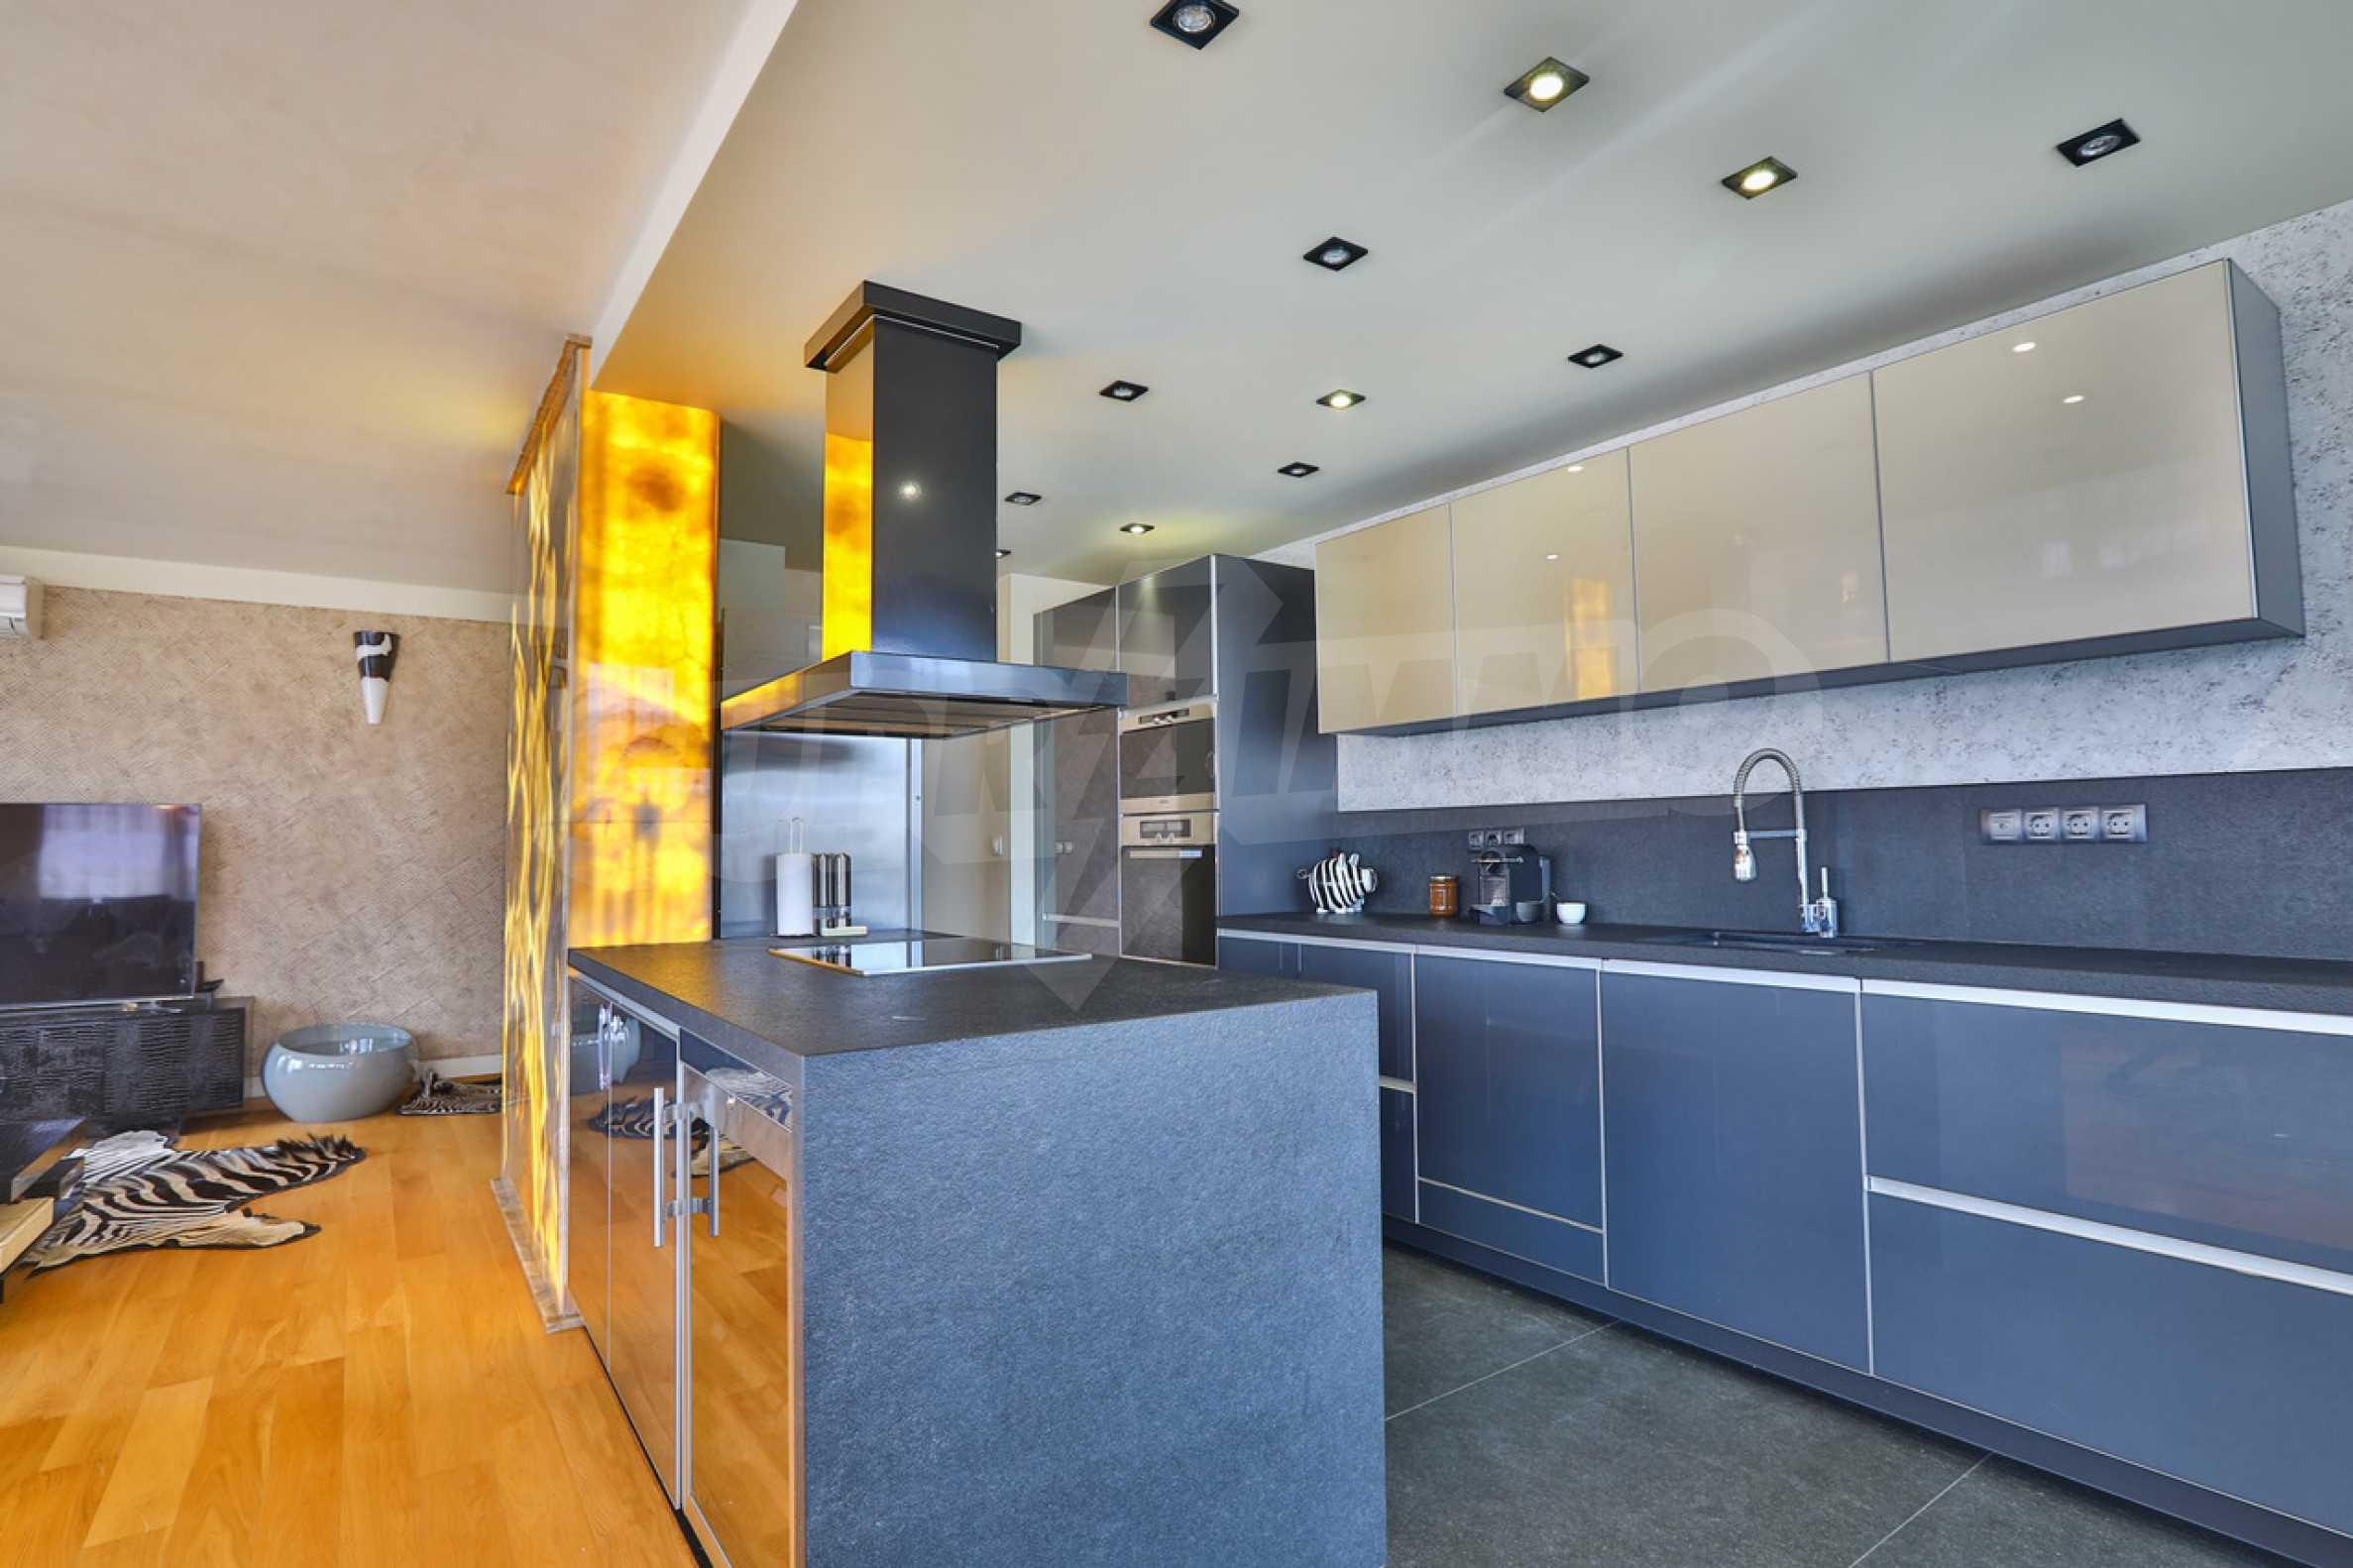 2-bedroom apartment in Sofia 3